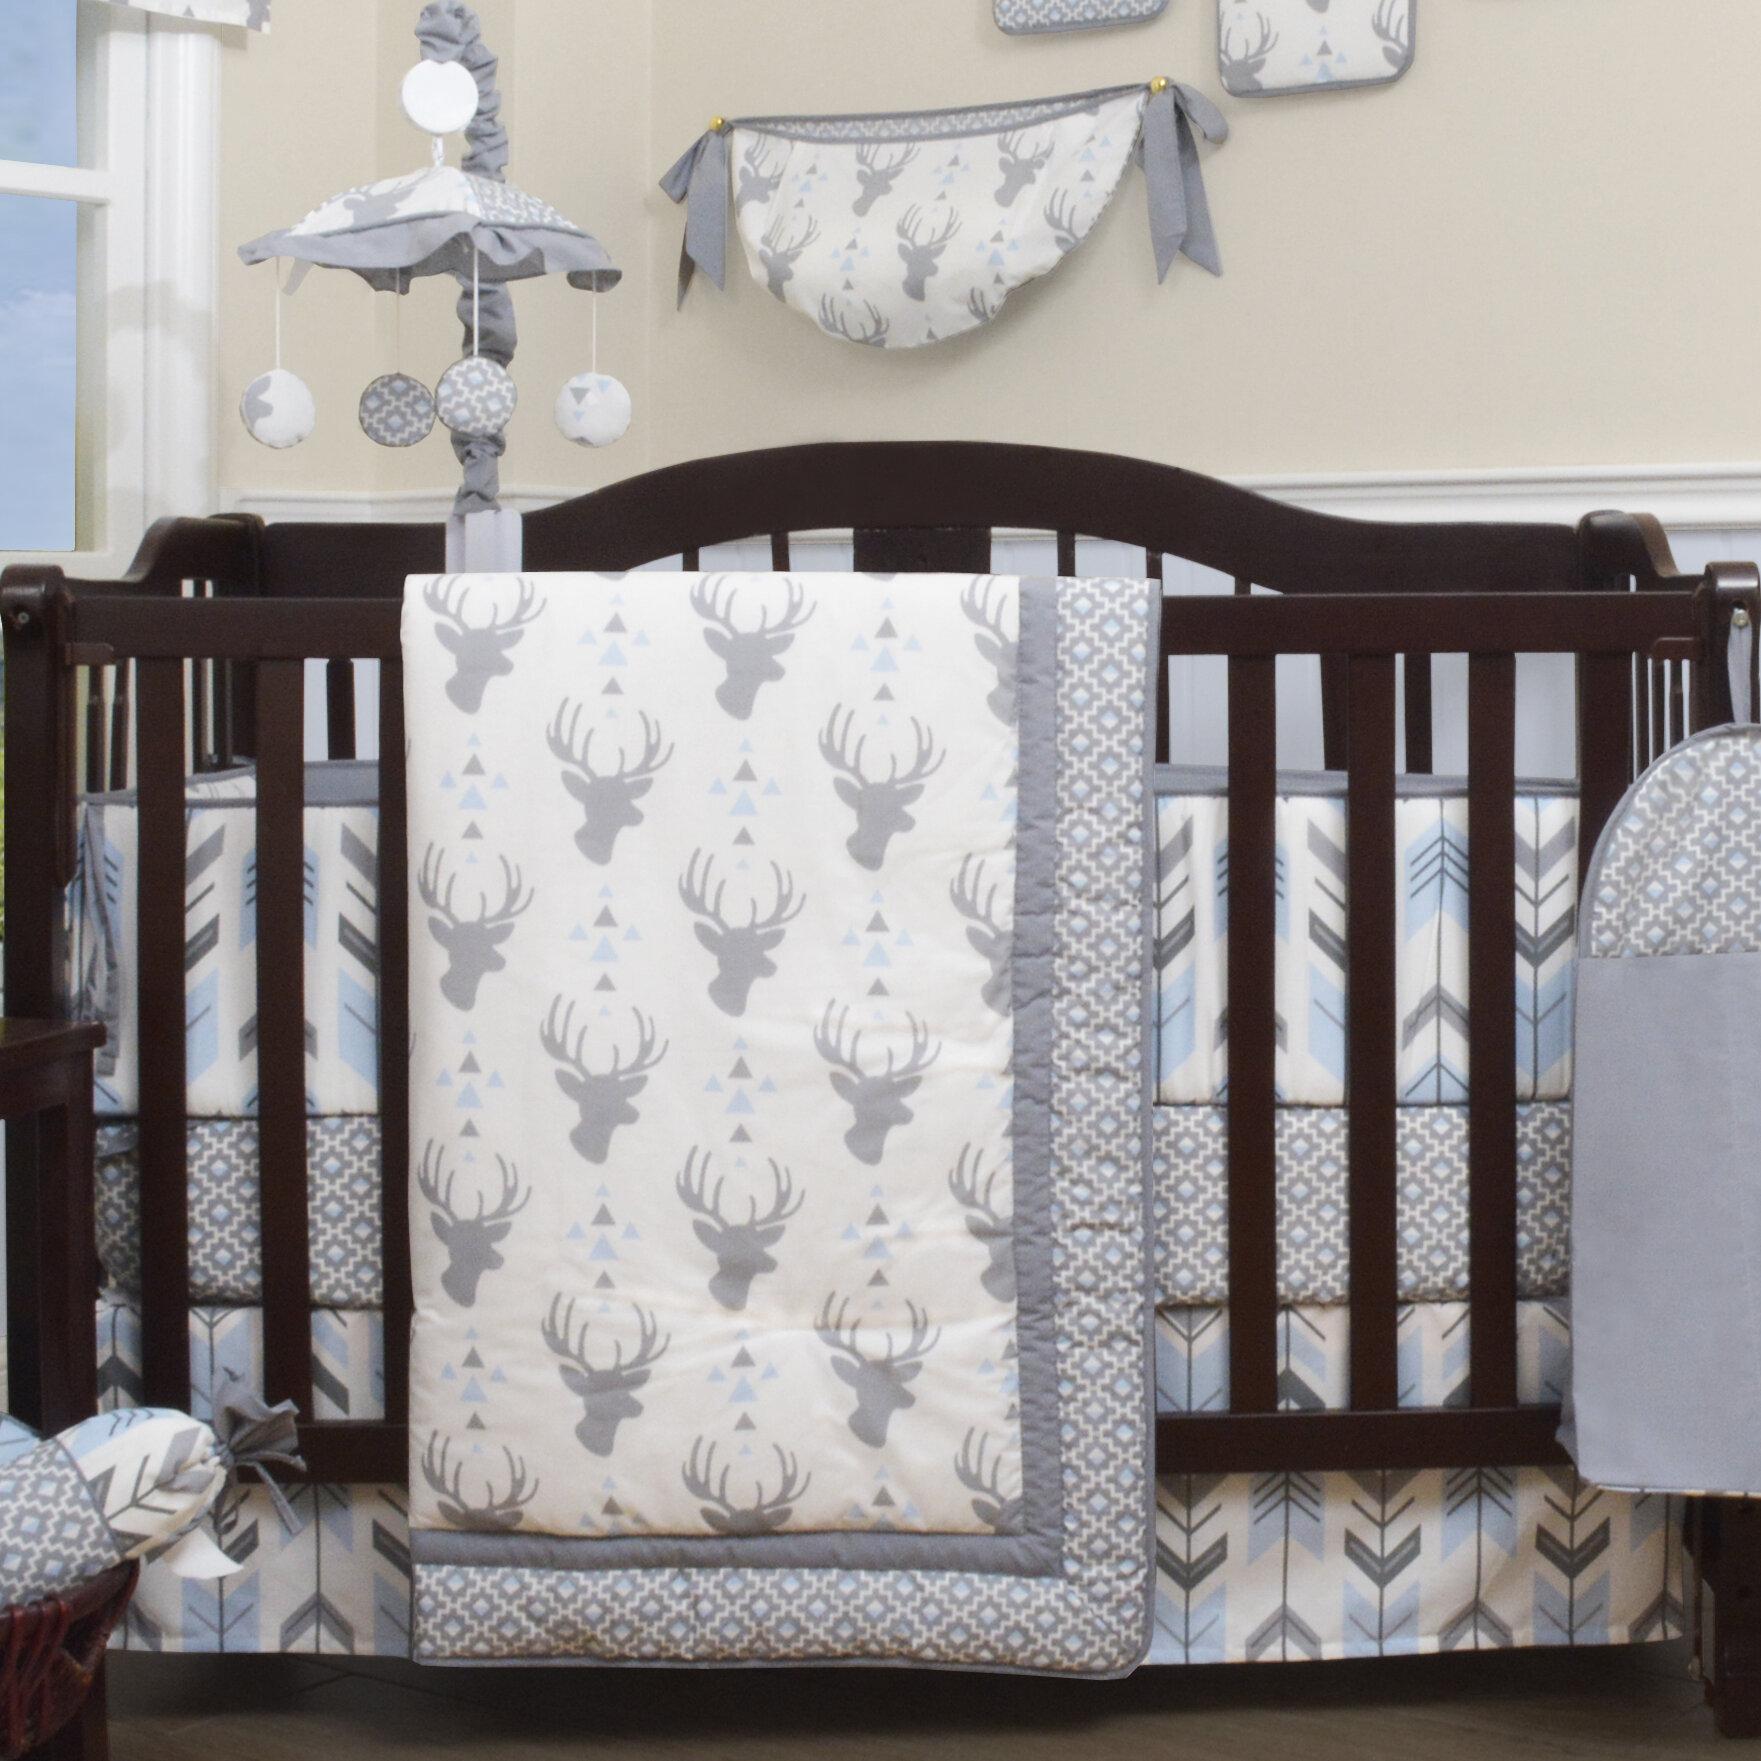 13 Pc Pink Gray Chevron Crib Bedding Set Baby Girl Nursery Quilt Bumper Diaper